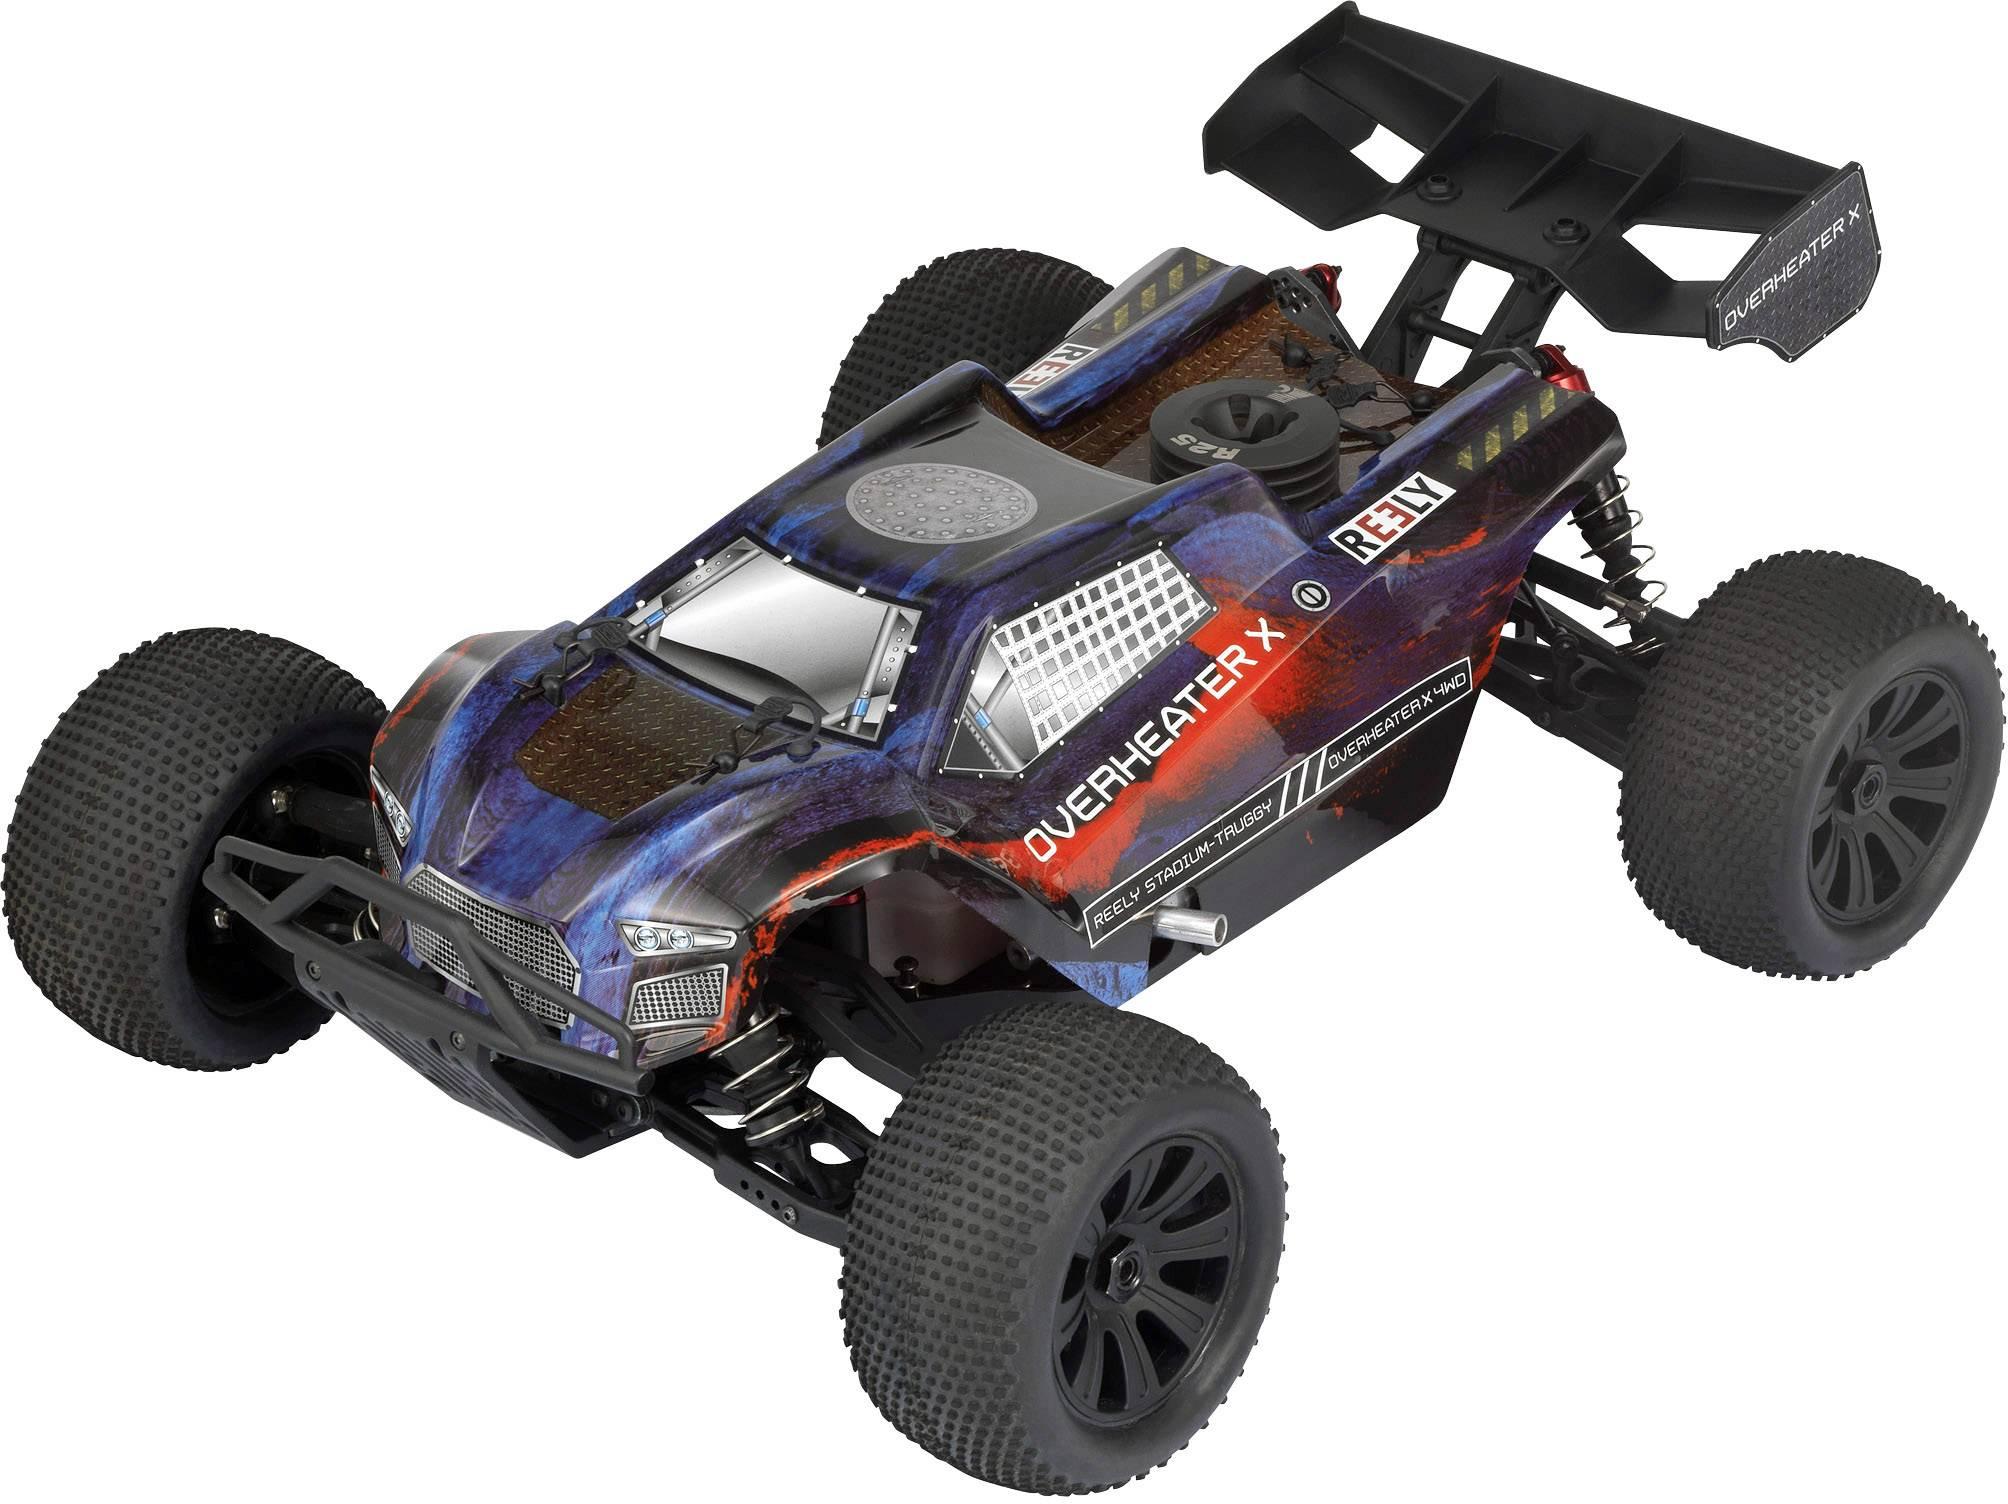 RC model auta truggy Reely Overheater, 1:8, spaľovací motor, 4WD (4x4), RtR, 65 km/h